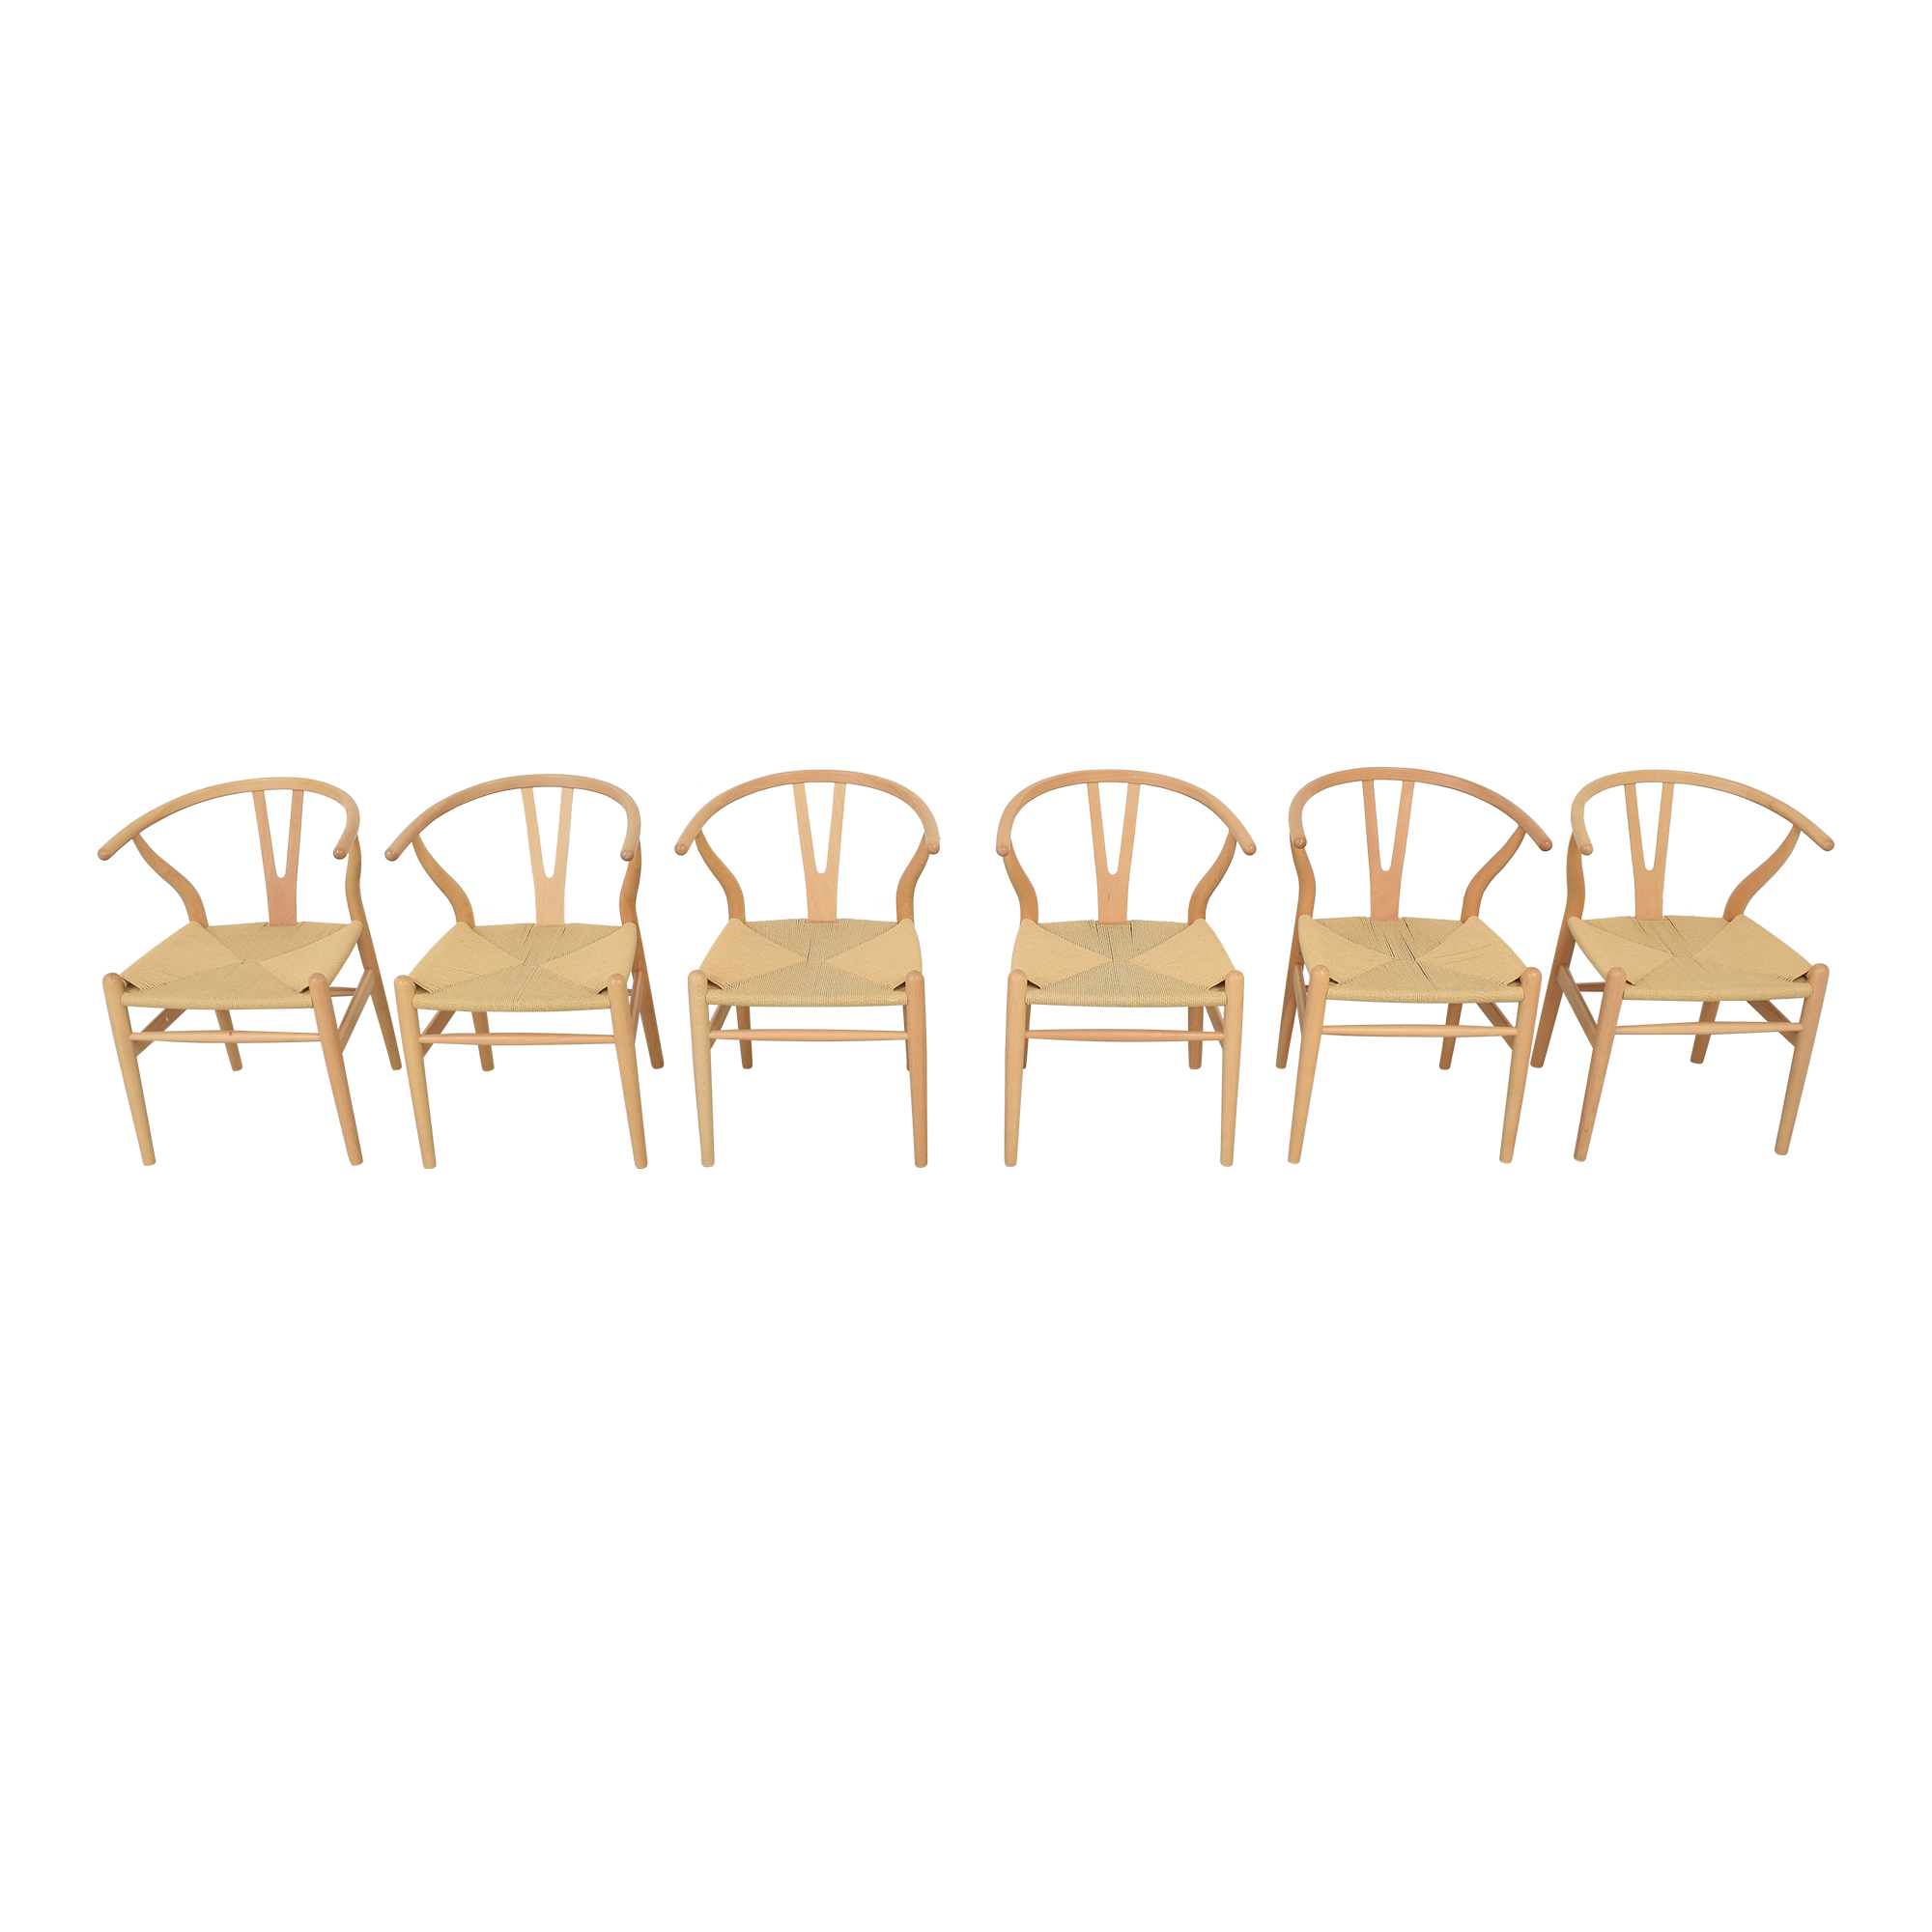 Baxton Studio Baxton Studio Wishbone Modern Brown Wood Dining Chairs dimensions